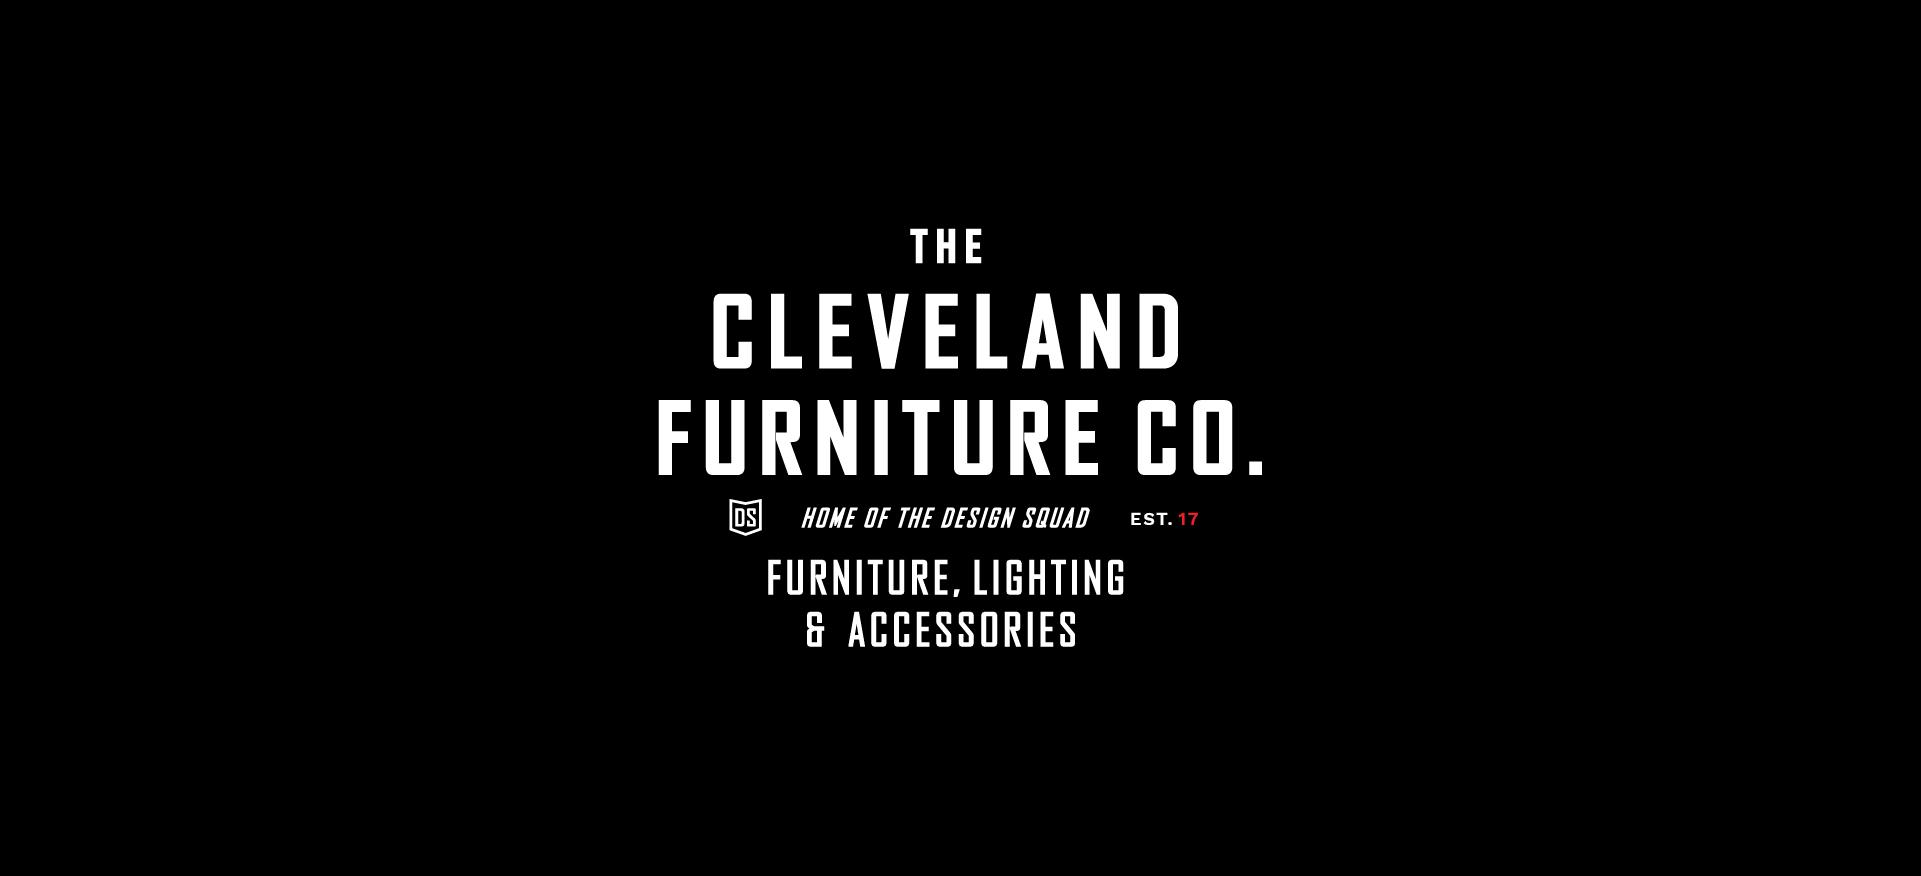 Cleveland Furniture Company Go Media Creativity At Work